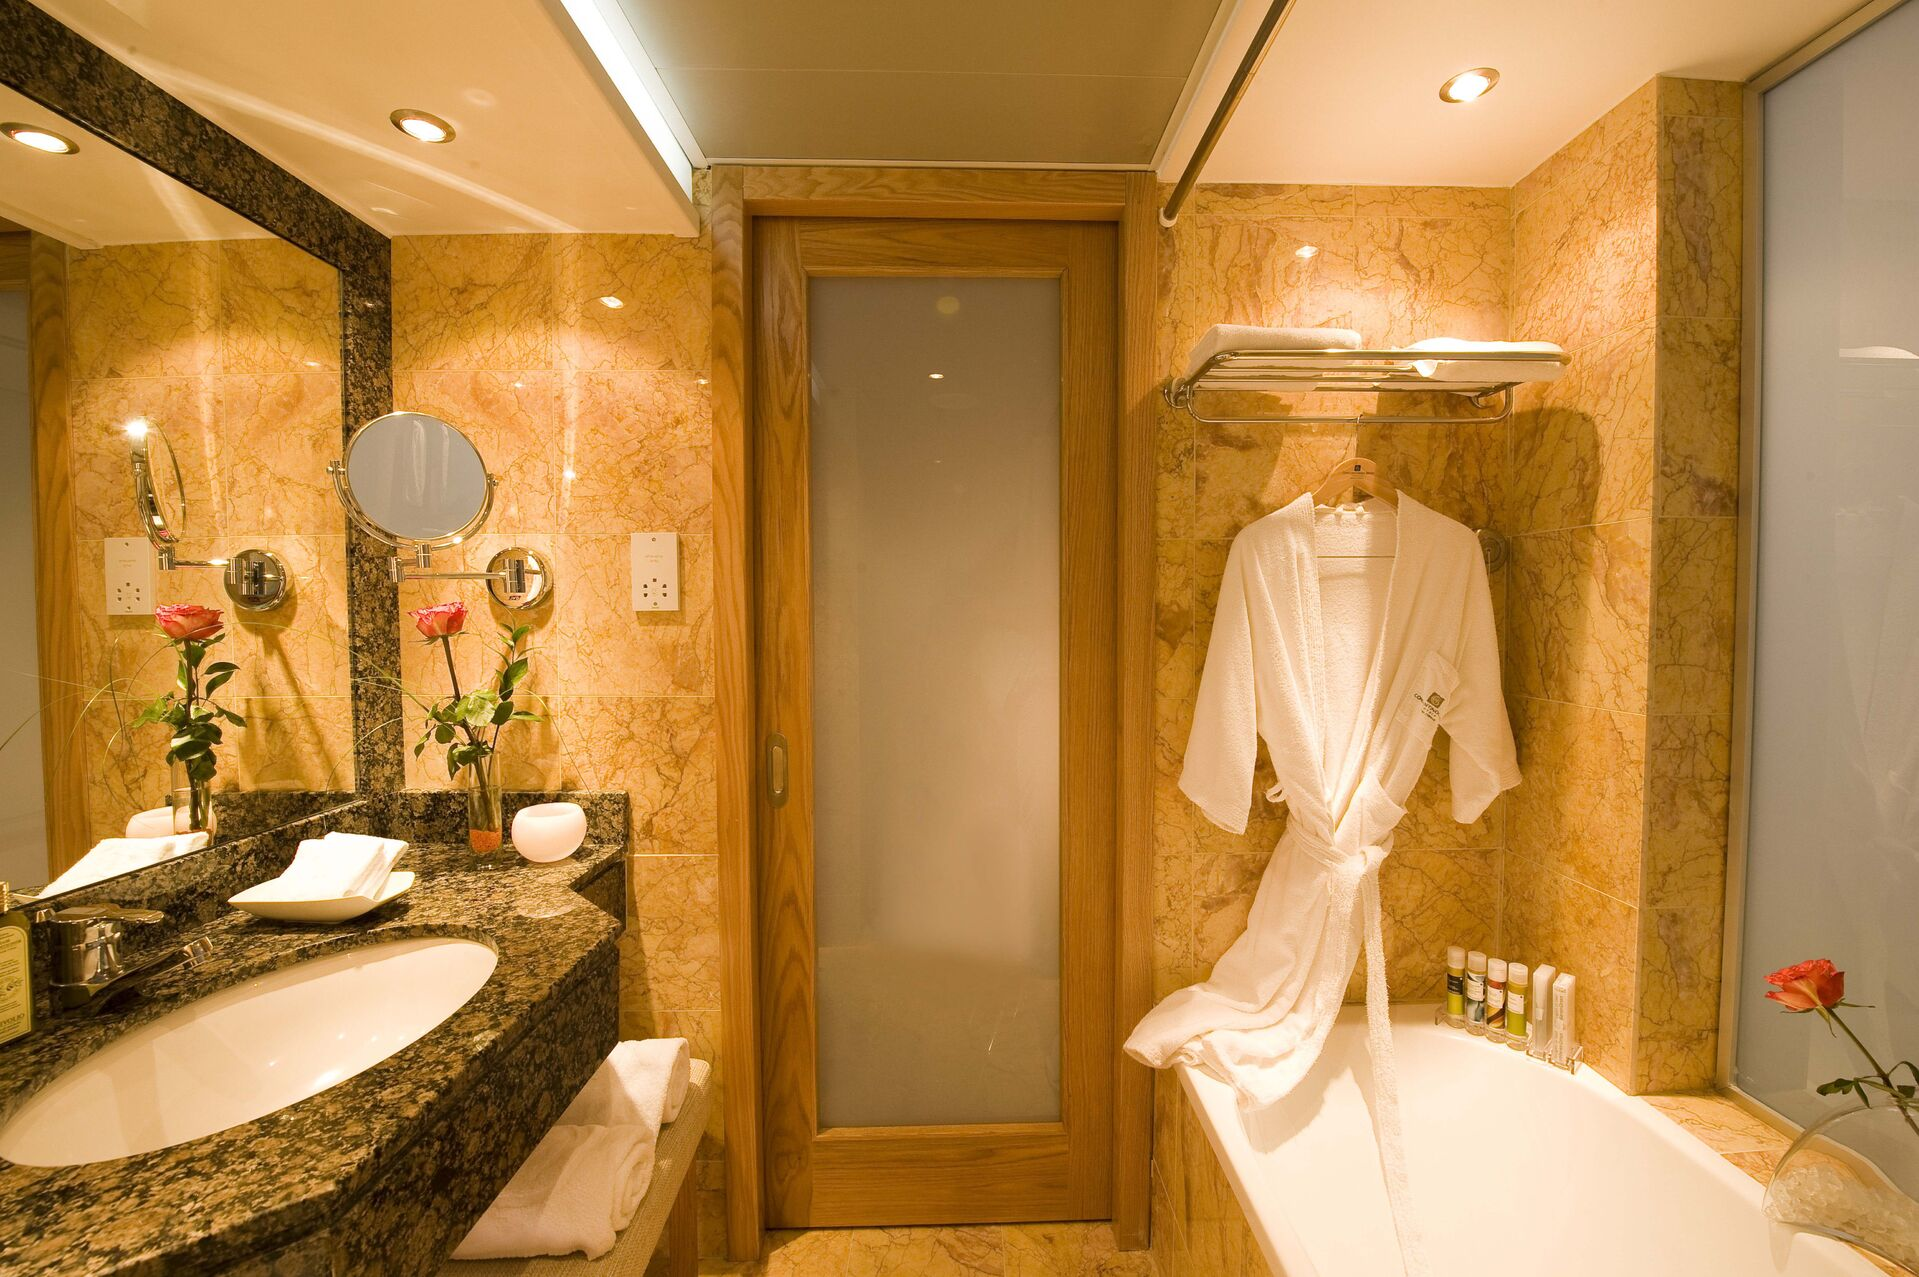 https://cms.satur.sk/data/imgs/tour_image/orig/25-pioneer-beach-hotel-bathroom-all-room-types-1972646.jpg